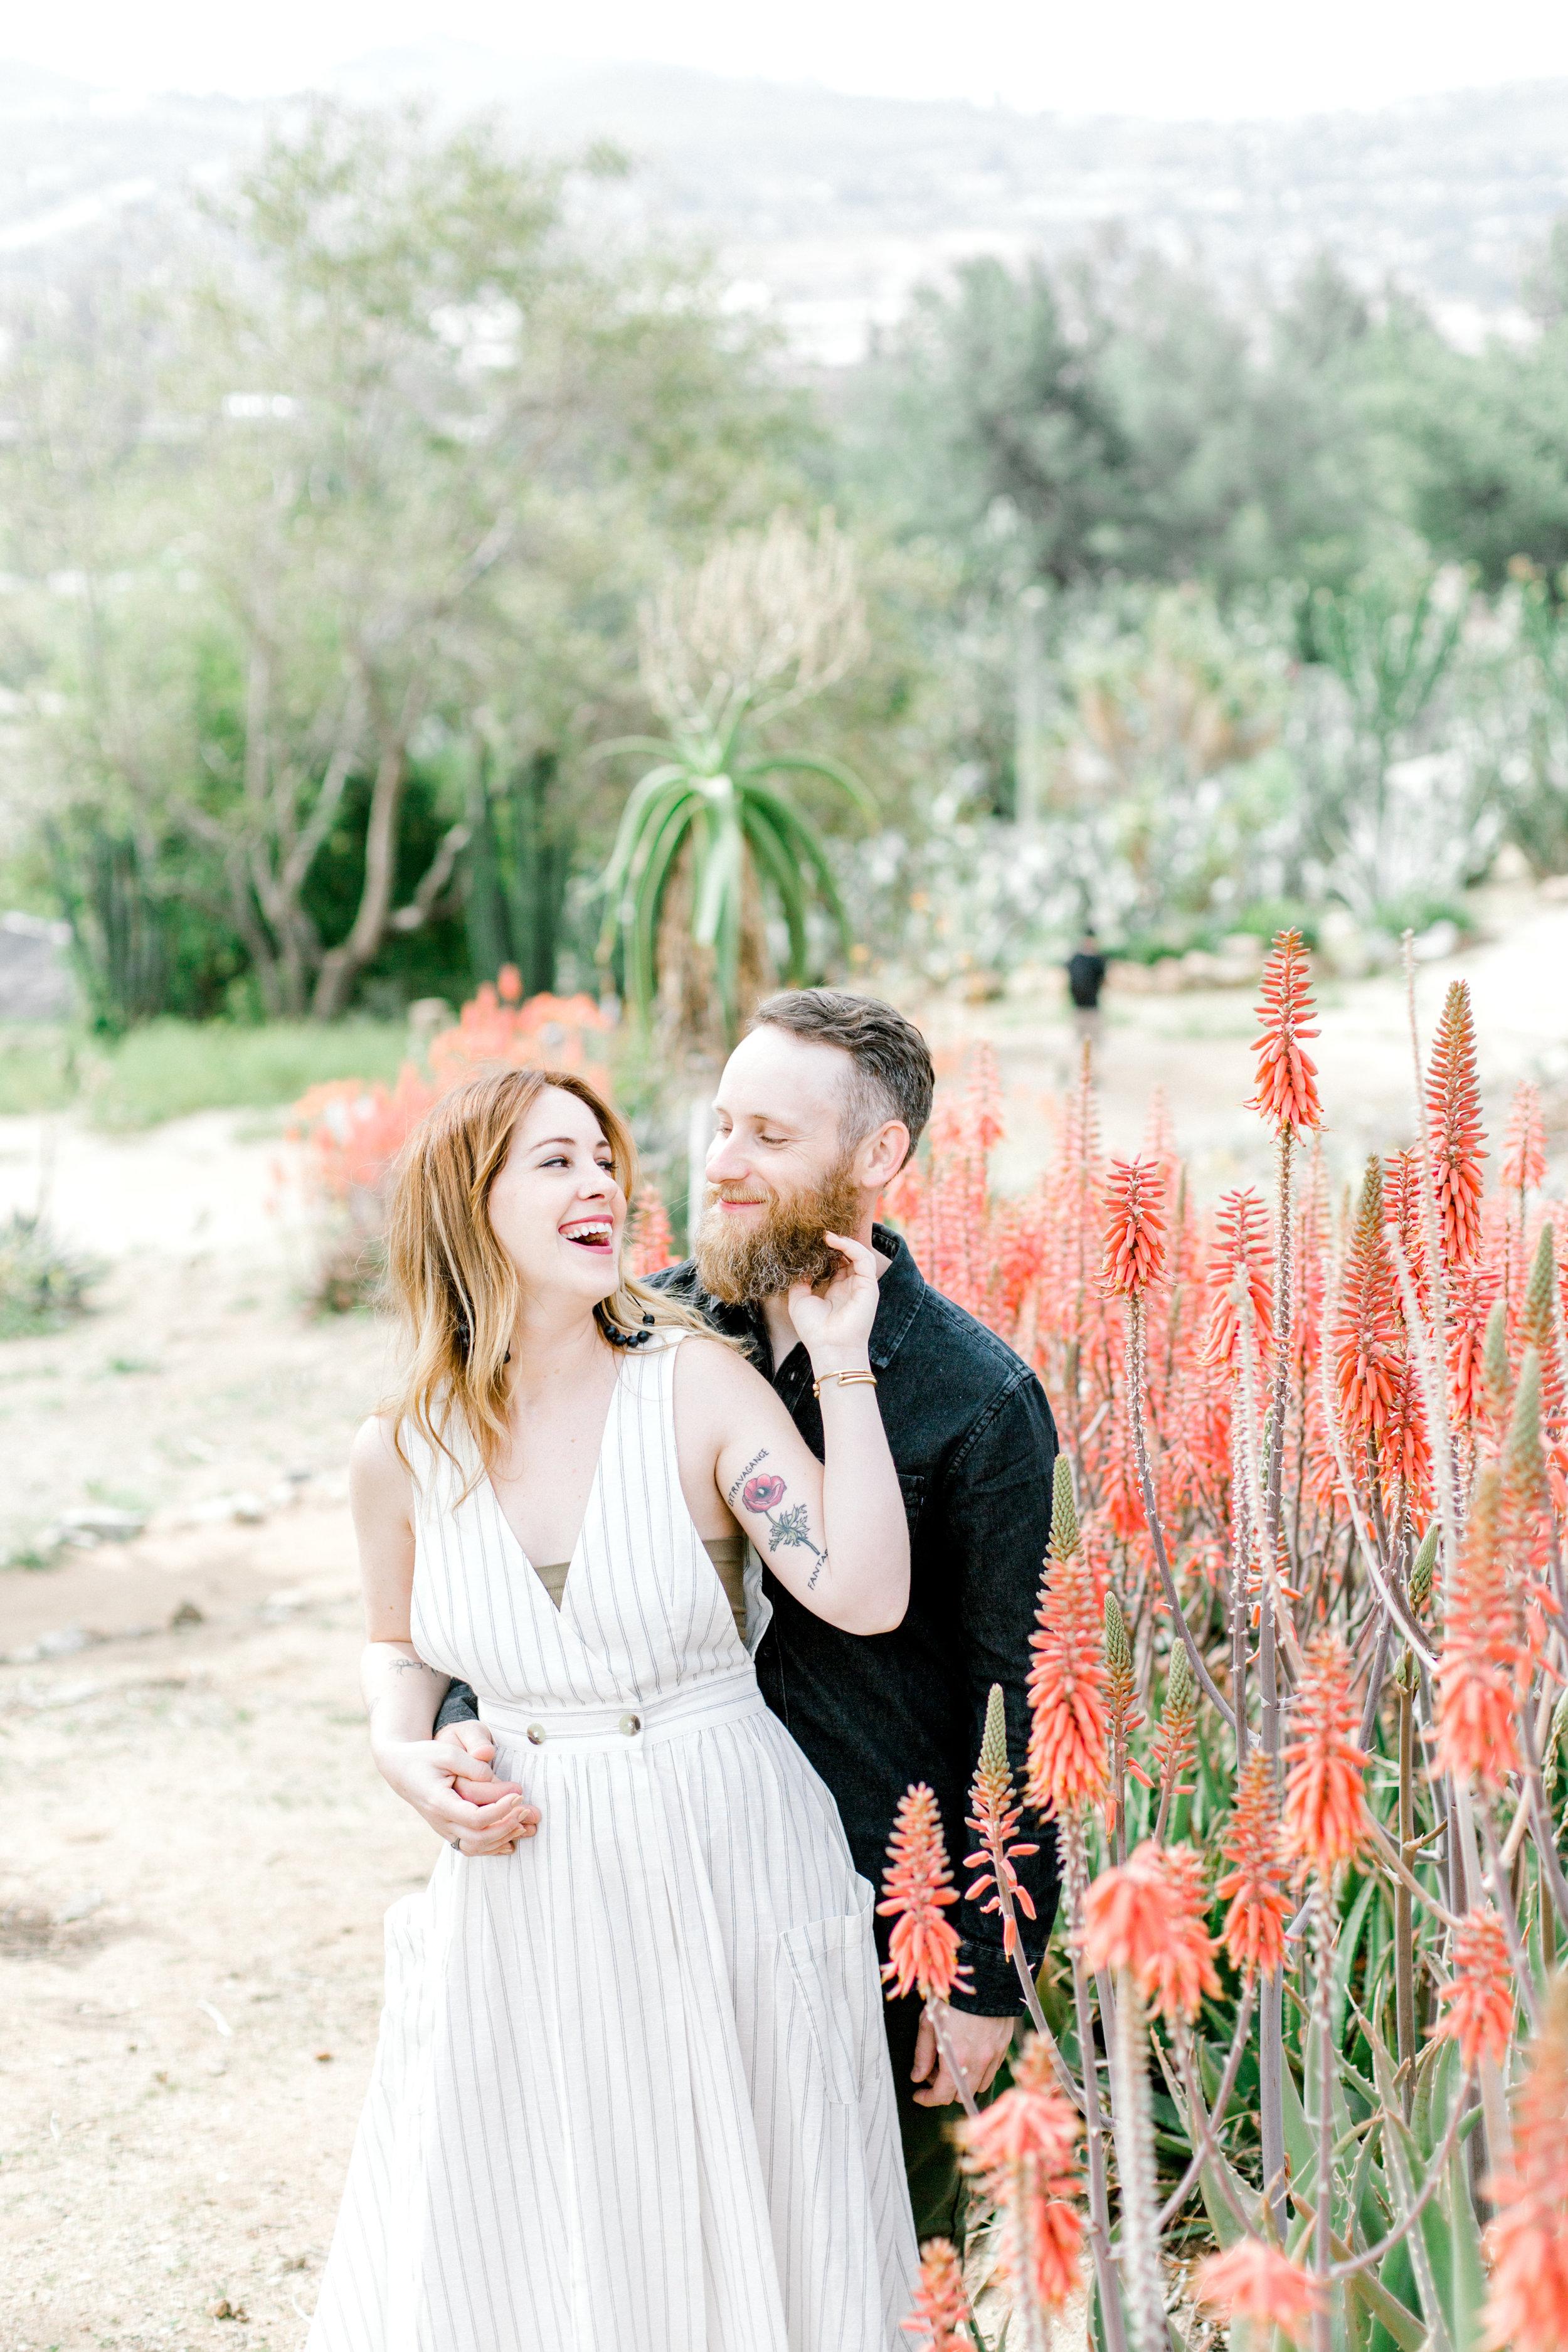 jessica sgubin photography atlanta portrait photographer cacti garden engagement family couple wedding joshua tree wedding elopement-18.jpg